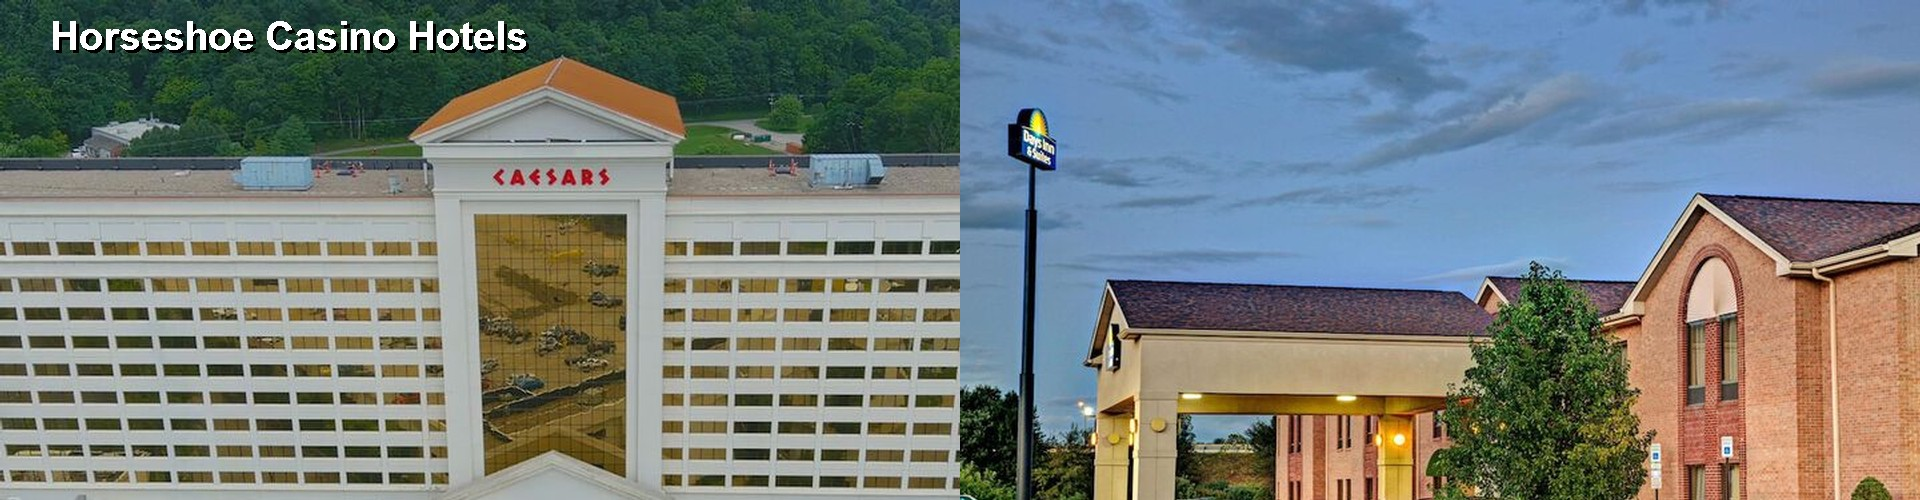 5 Best Hotels Near Horseshoe